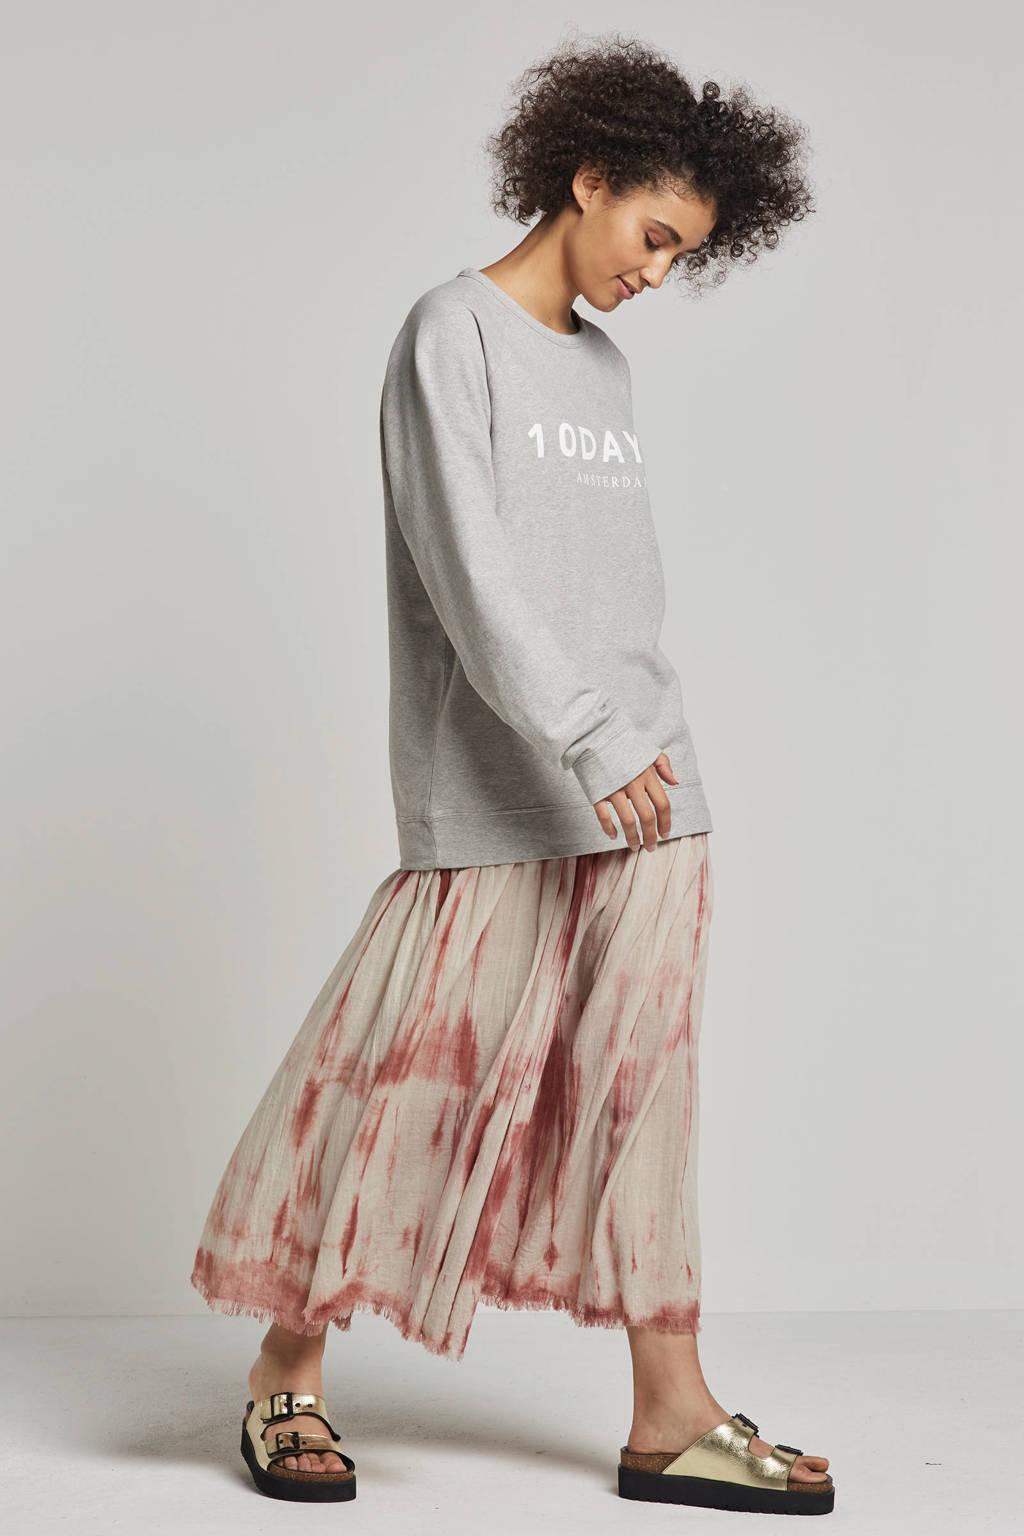 10DAYS sweater met printopdruk, Lichtgrijs/wit